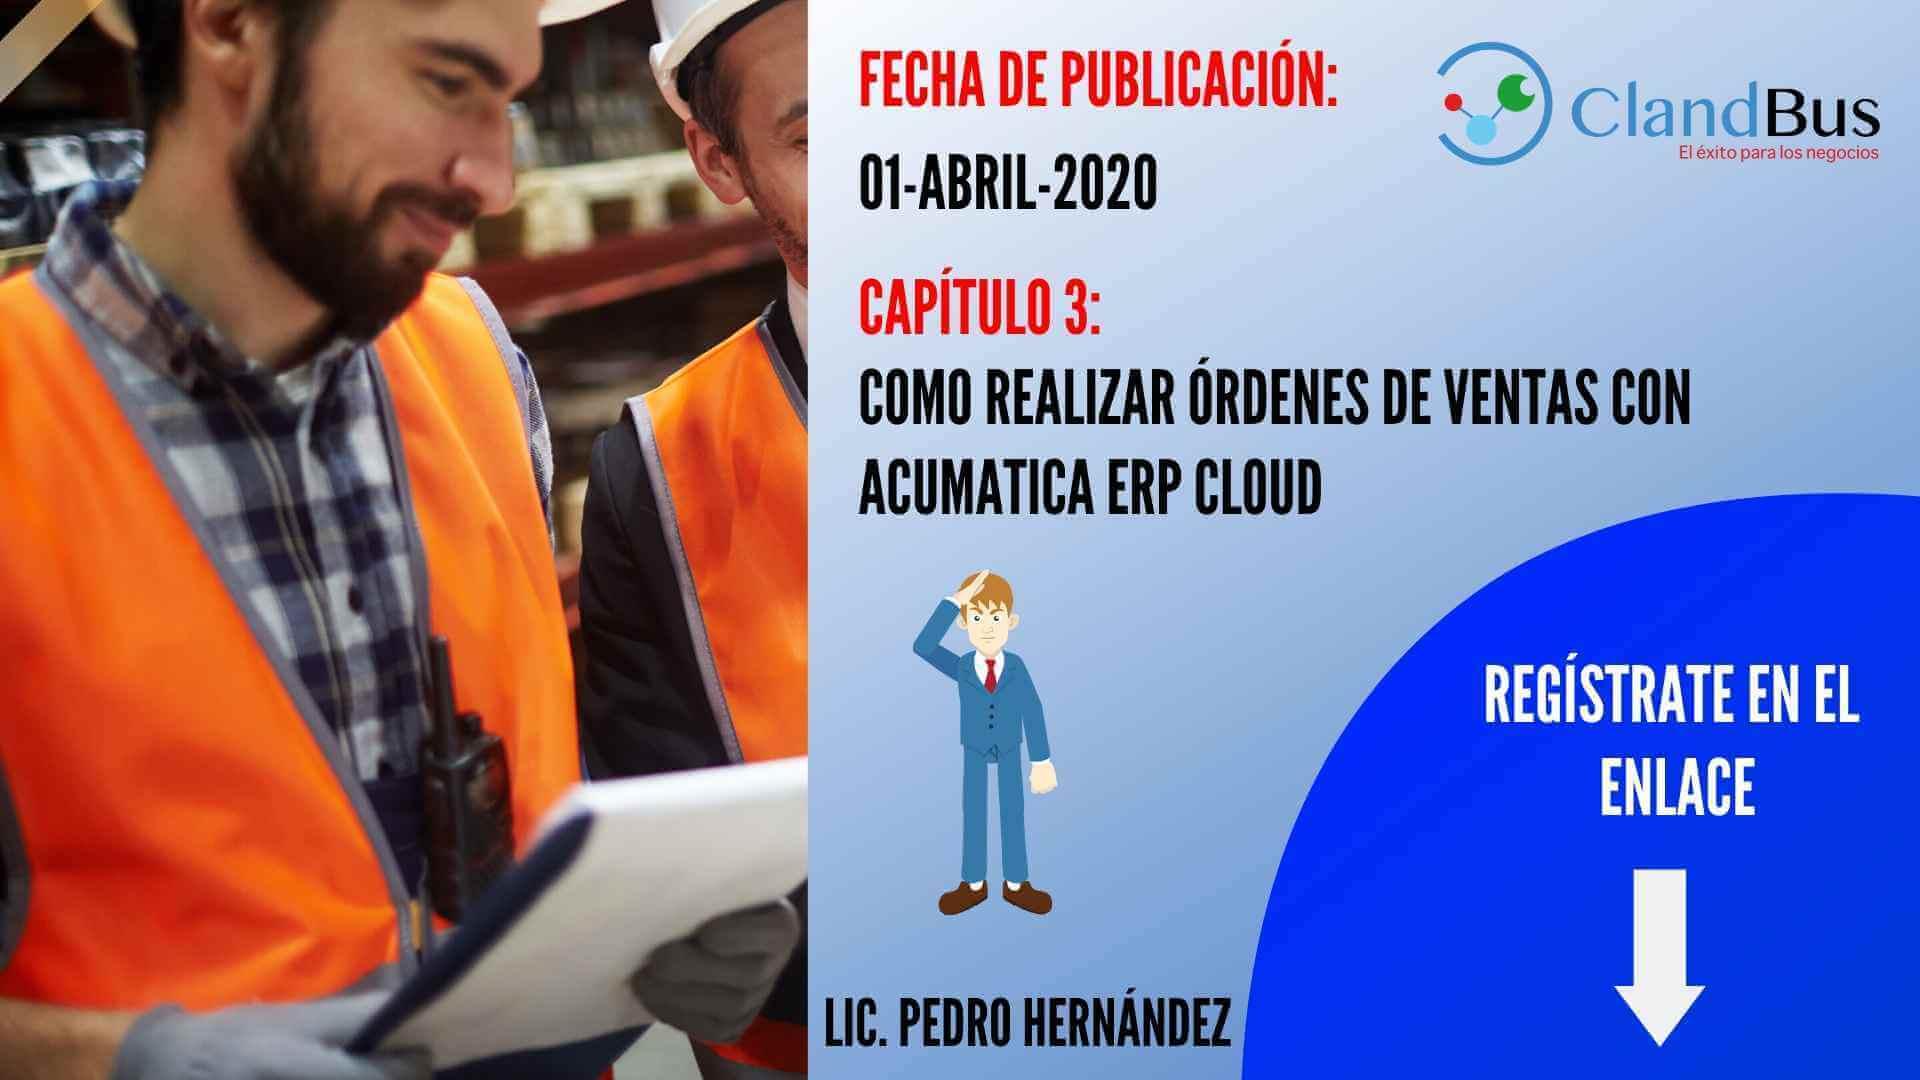 Resolución de problemas con Acumatica - COMO REALIZAR ÓRDENES DE VENTAS CON ACUMATICA ERP CLOUD